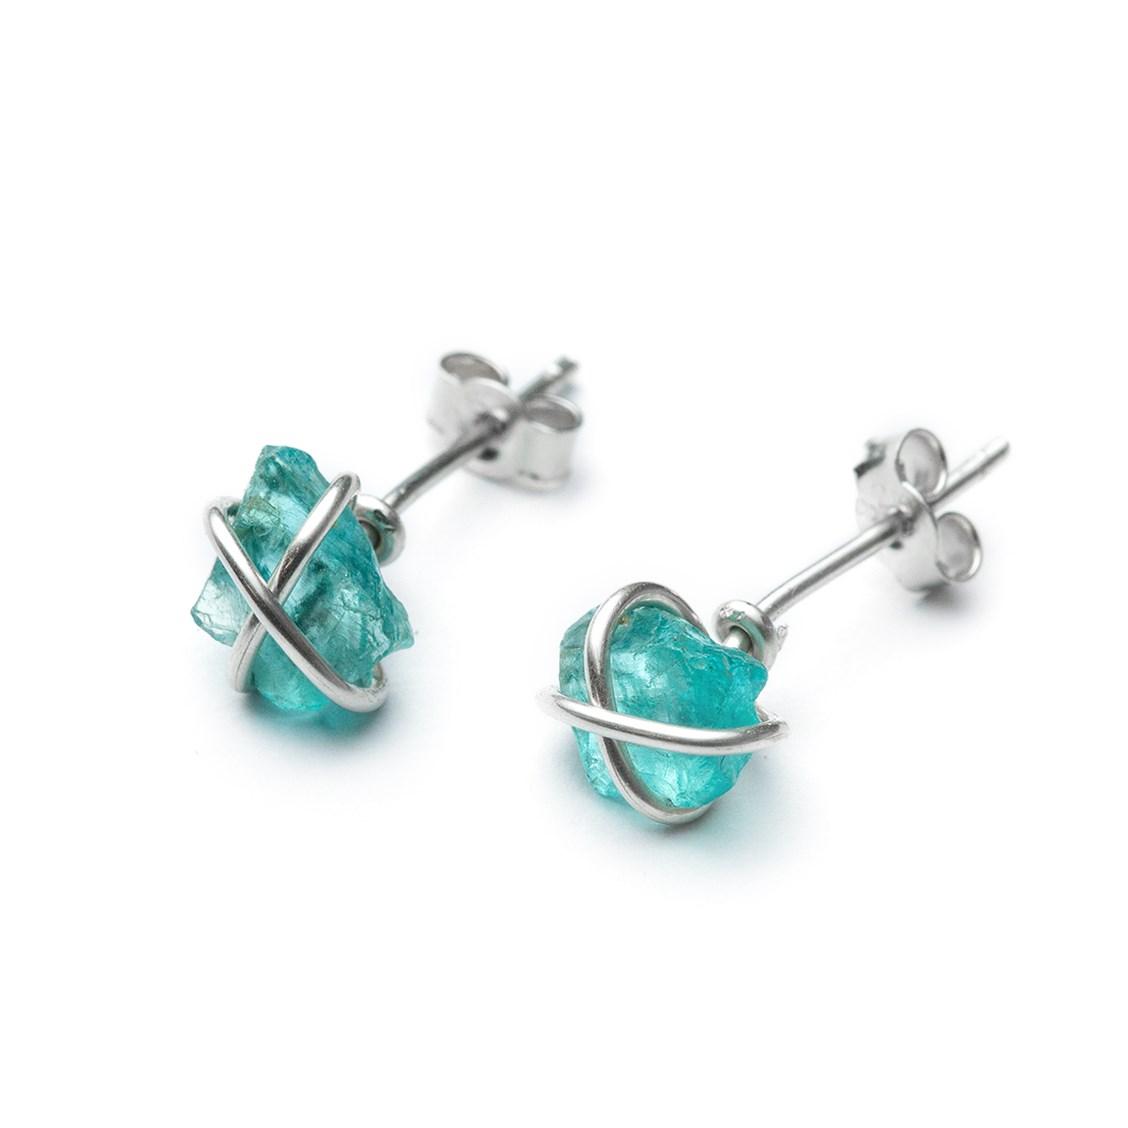 6 Easy Jewellery Design Ideas For Rough Gems | Kernowcraft